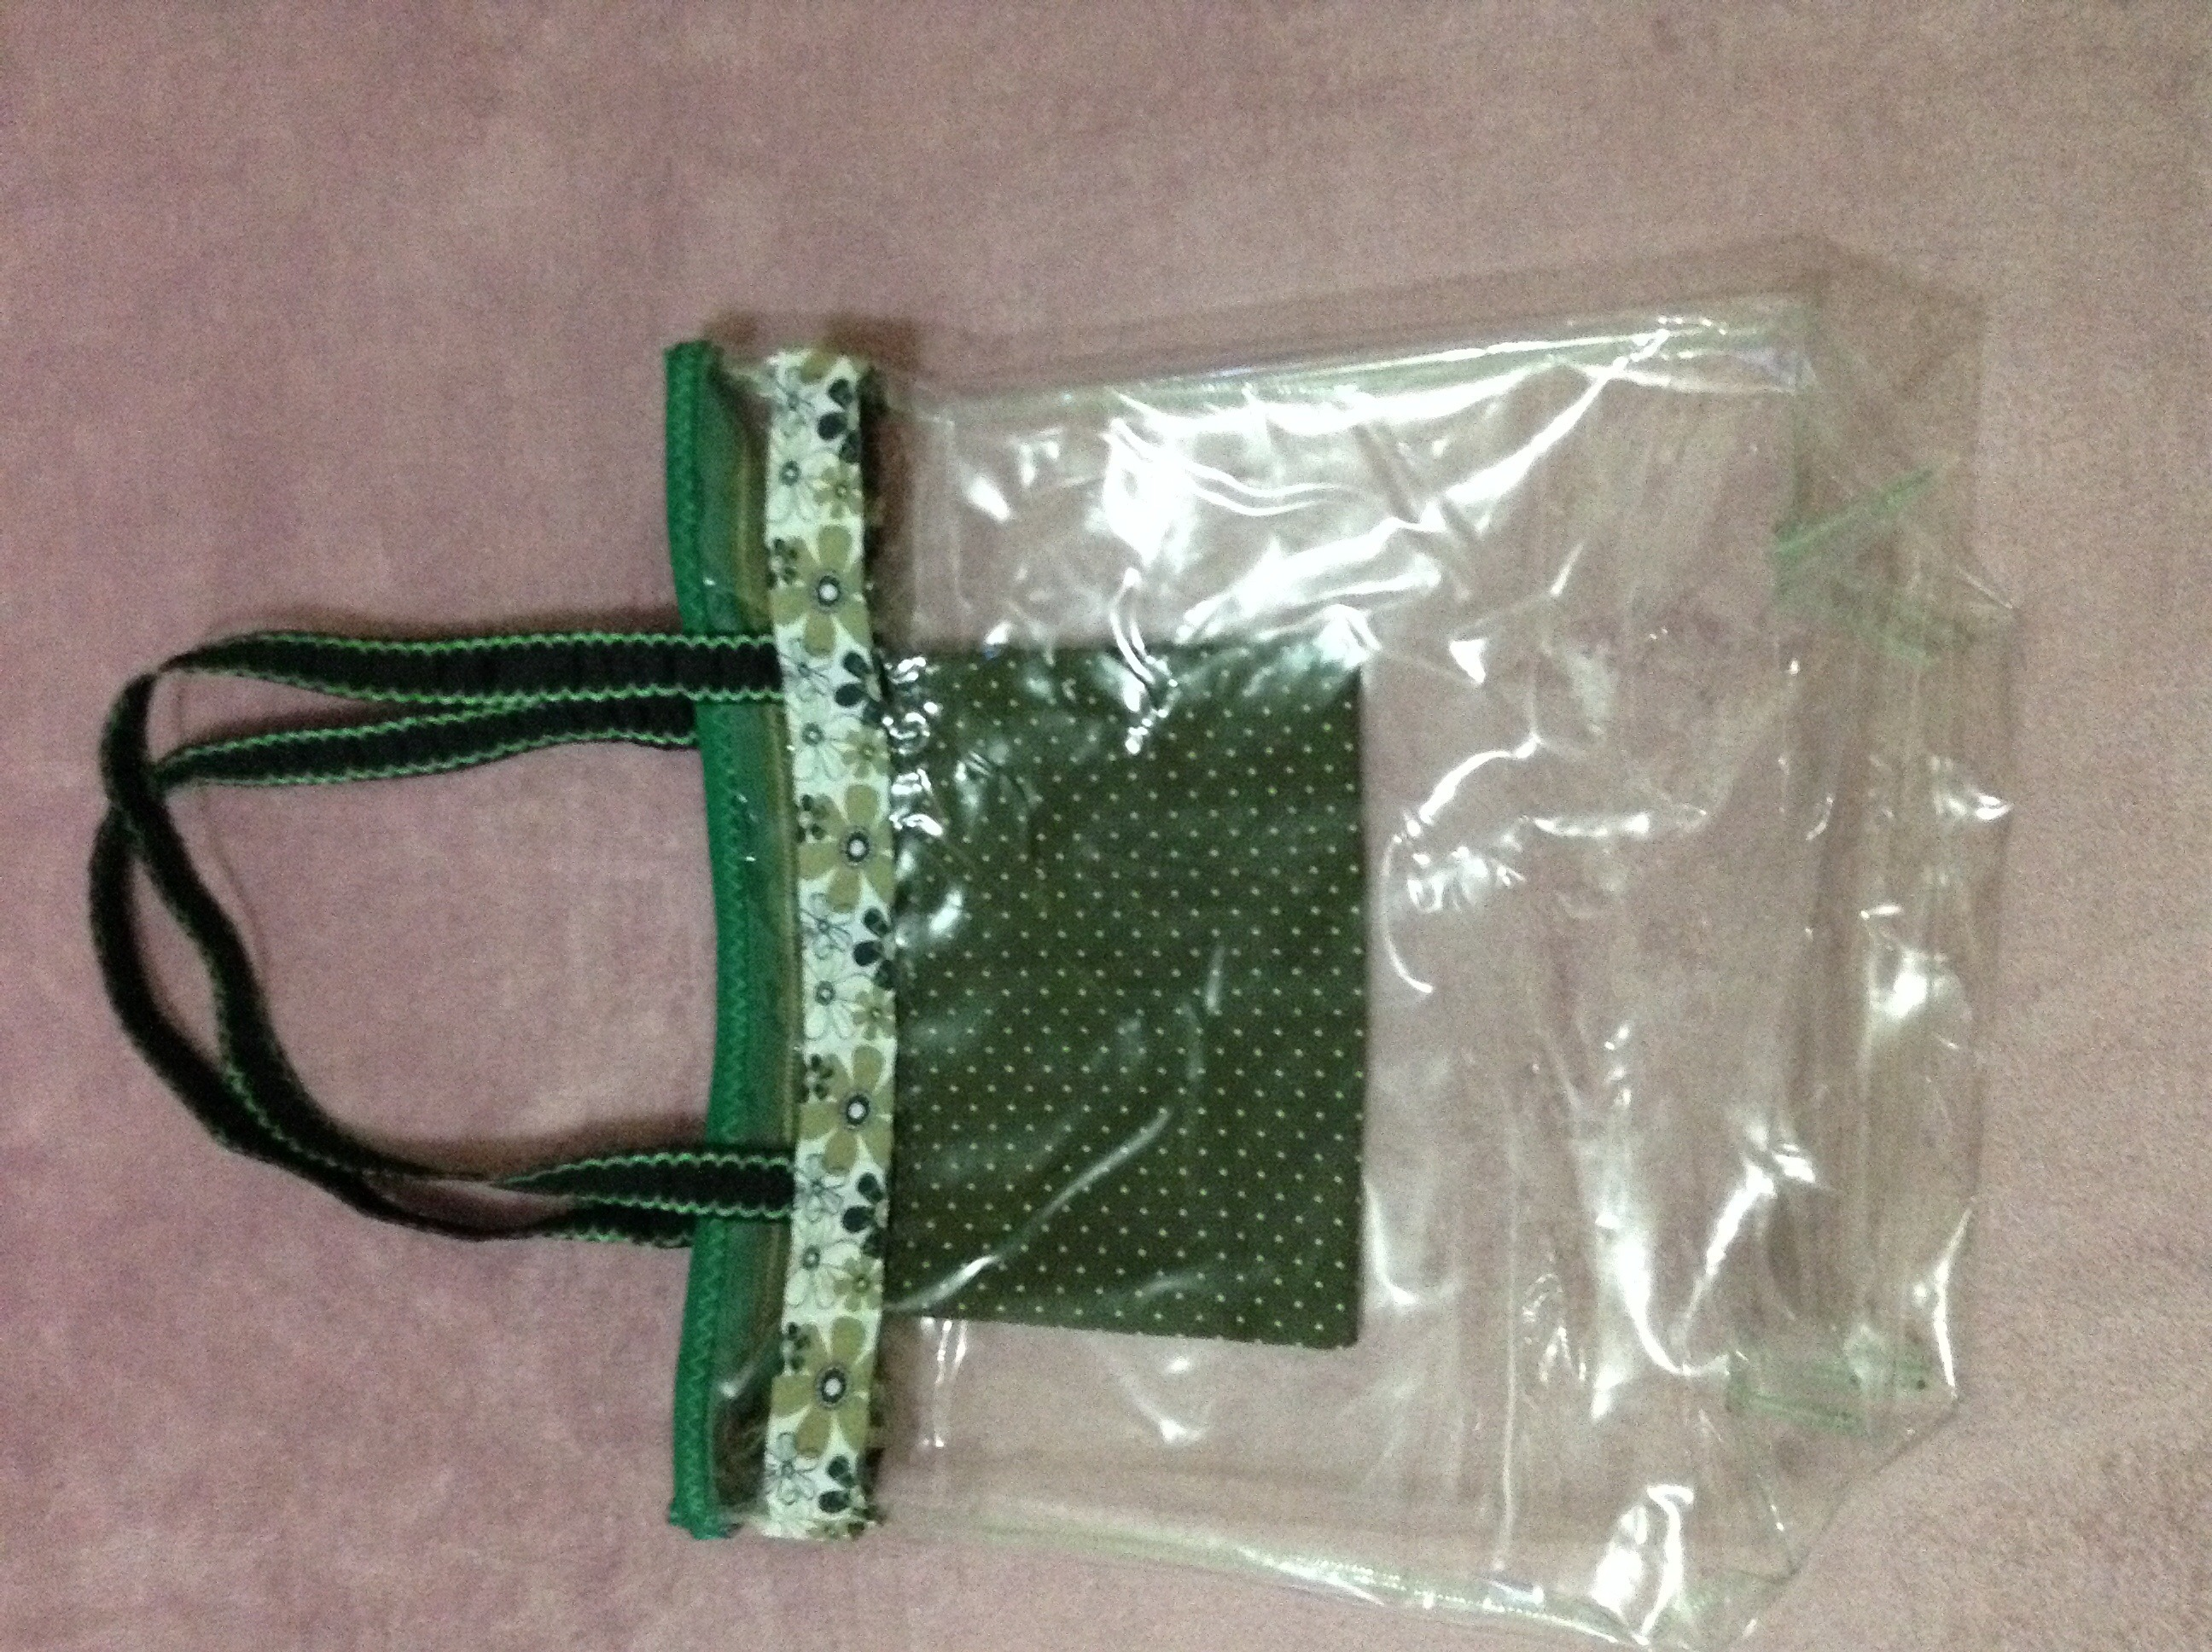 Bolsa de plástico Bolsa de plástico Bolsa de plástico Bolsa de  #3B5F43 2592x1936